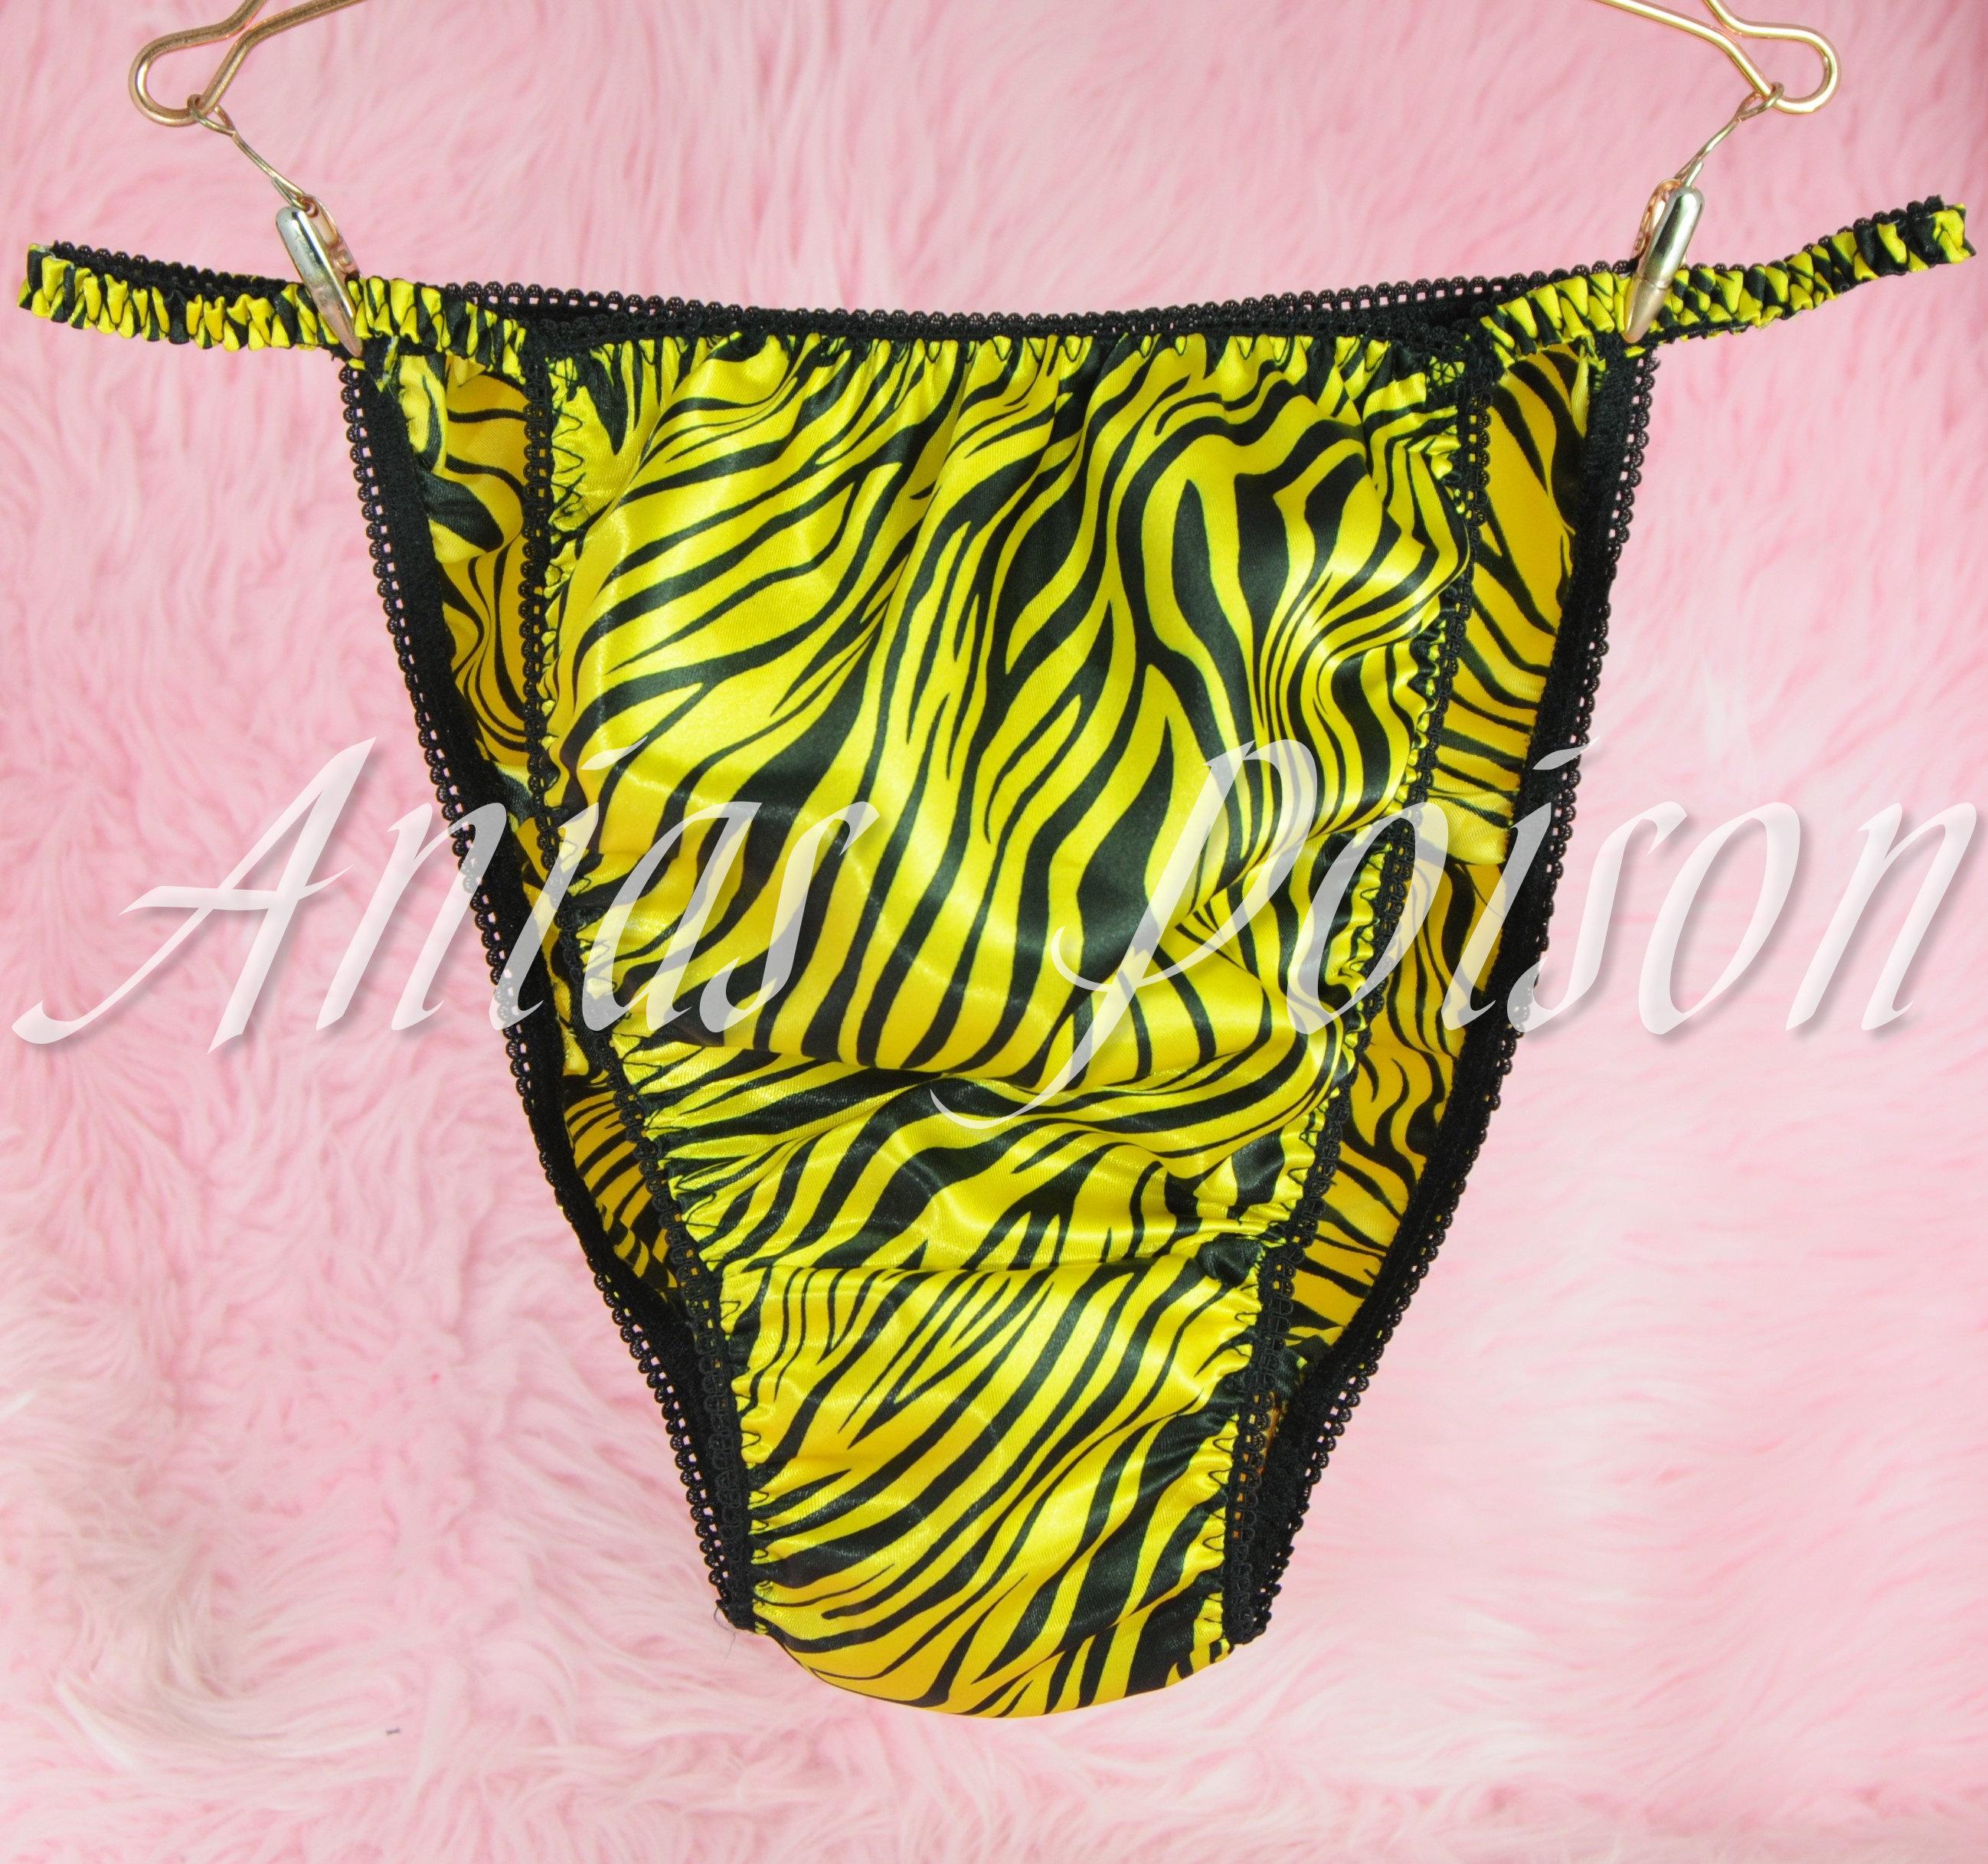 Ania's Poison MANties S - XXL Polka Dot shiny Rare 100% polyester string bikini sissy mens underwear panties 00209